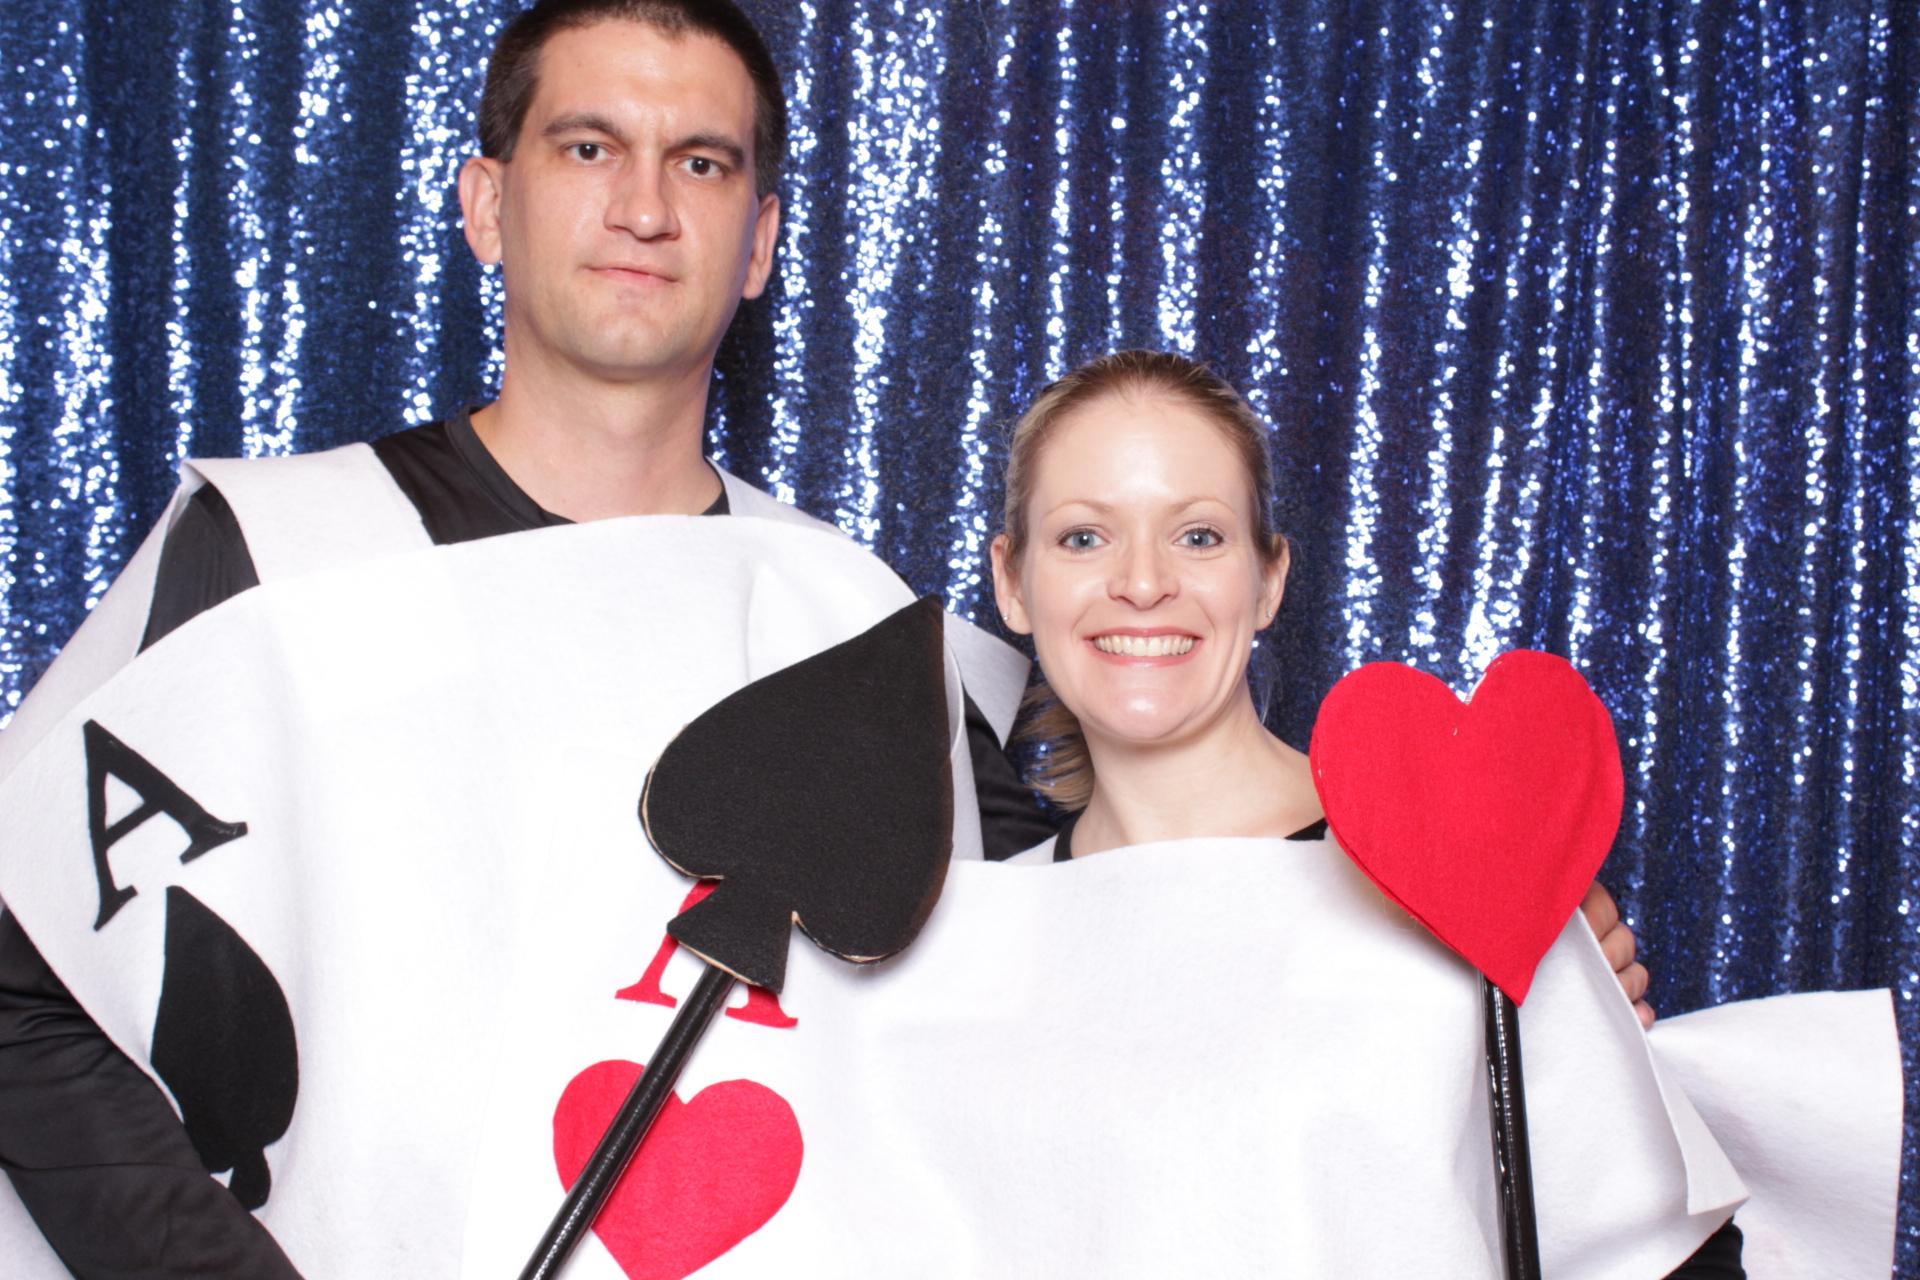 Sarasota Photo Booth Fun